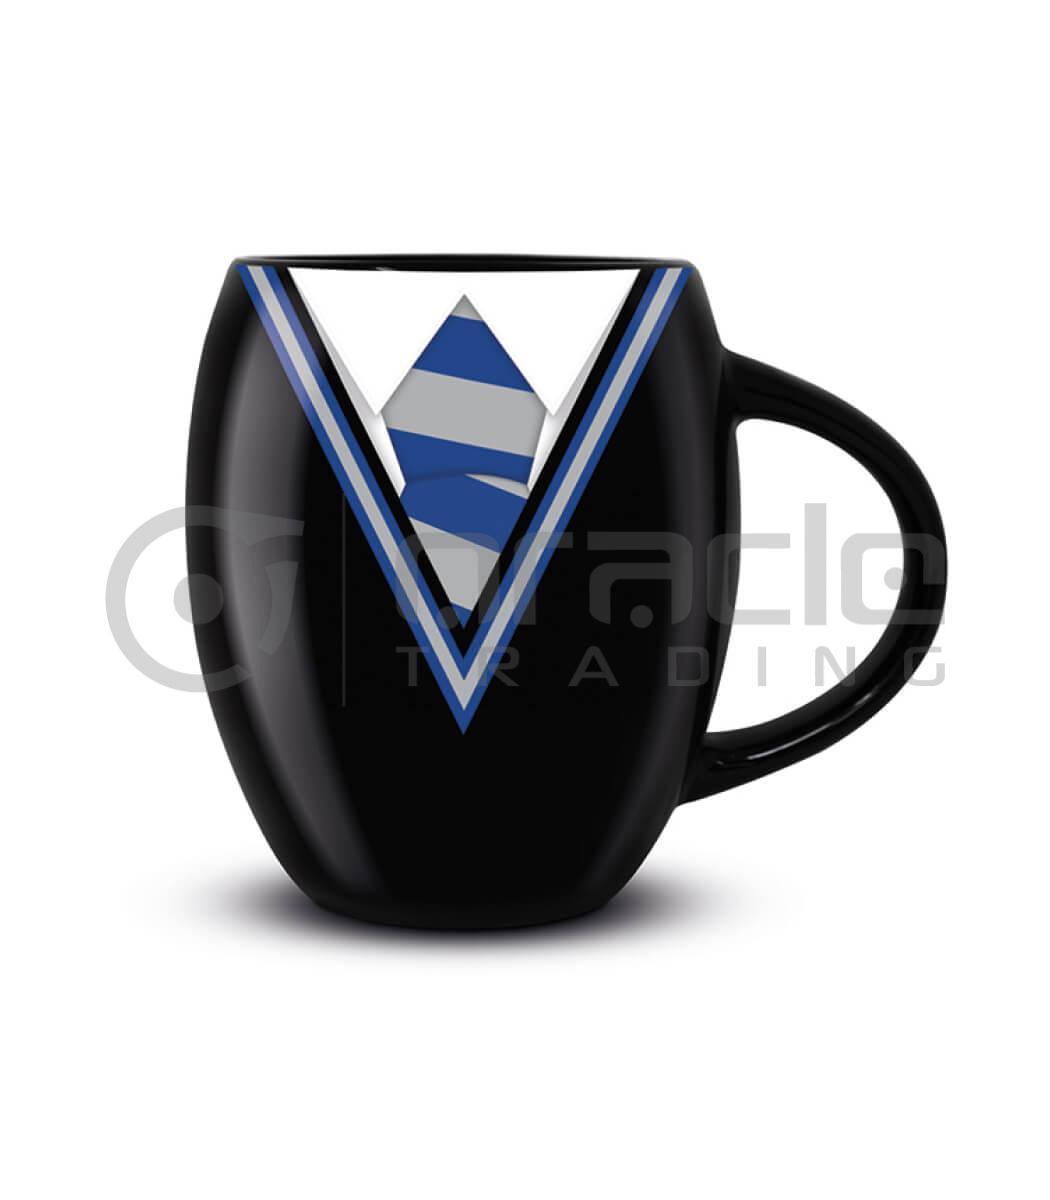 Harry Potter Oval Mug - Ravenclaw Uniform